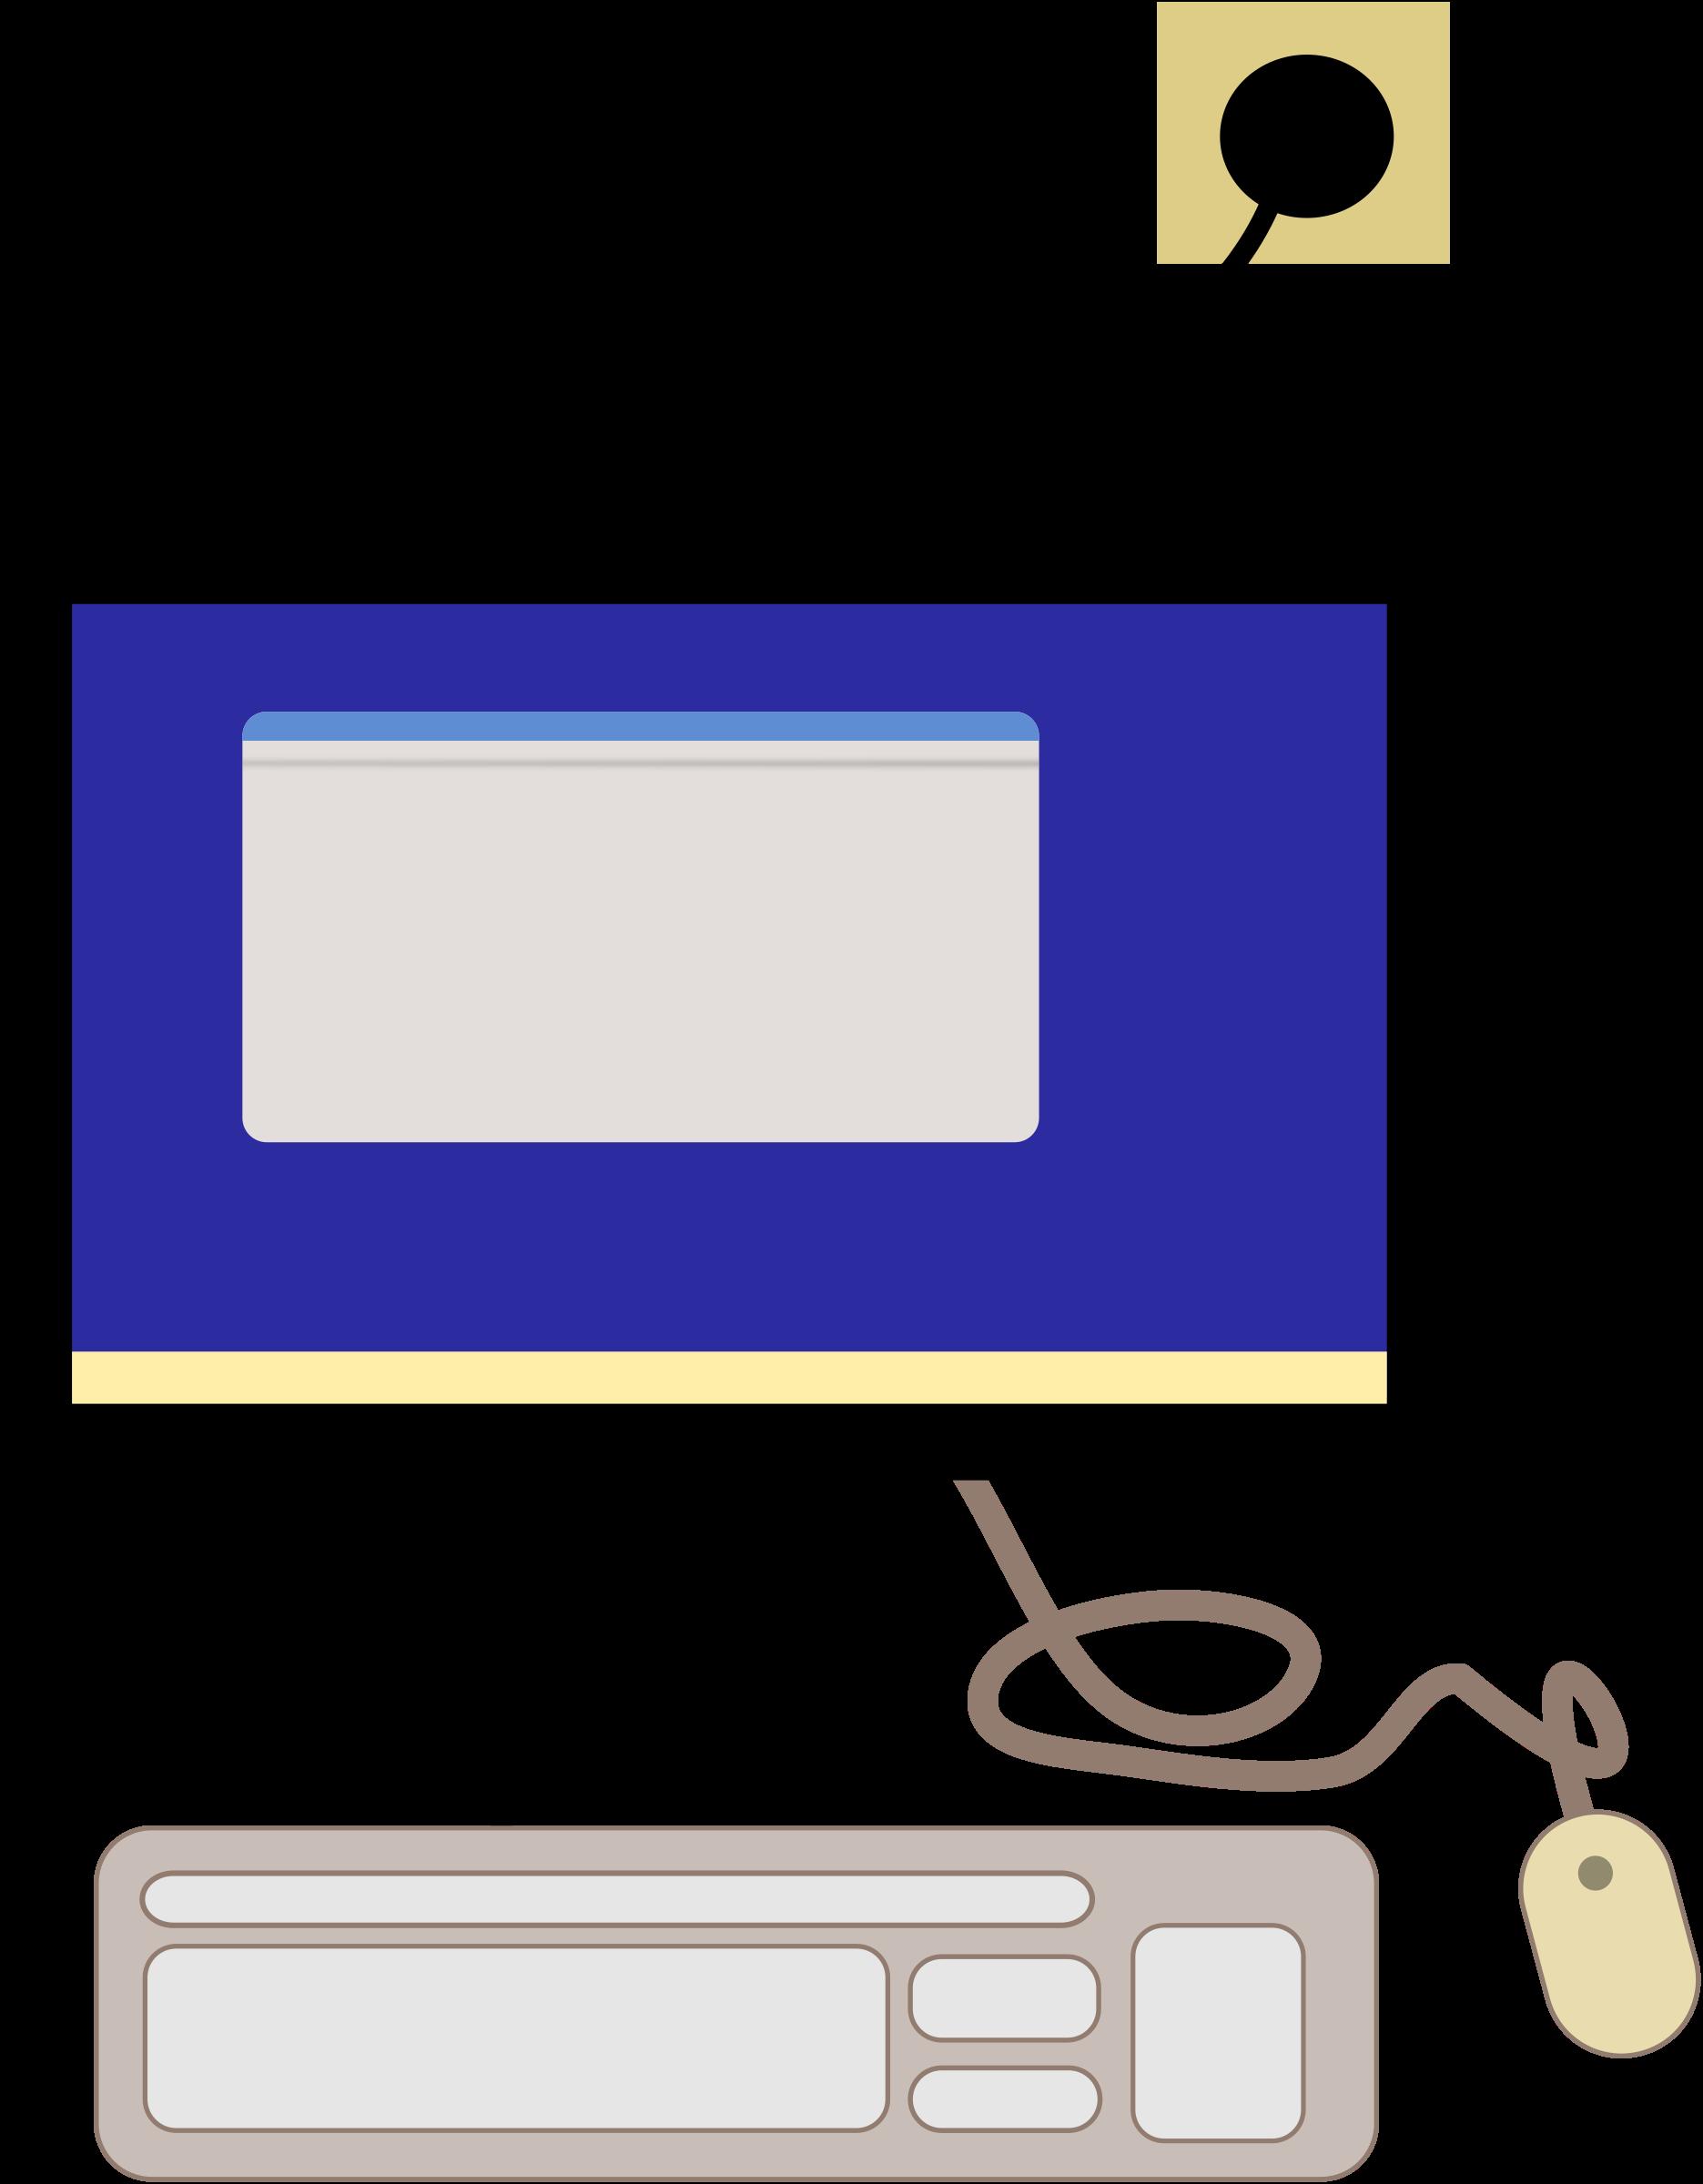 Clipart Computer Powerpoint Clipart Computer Powerpoint